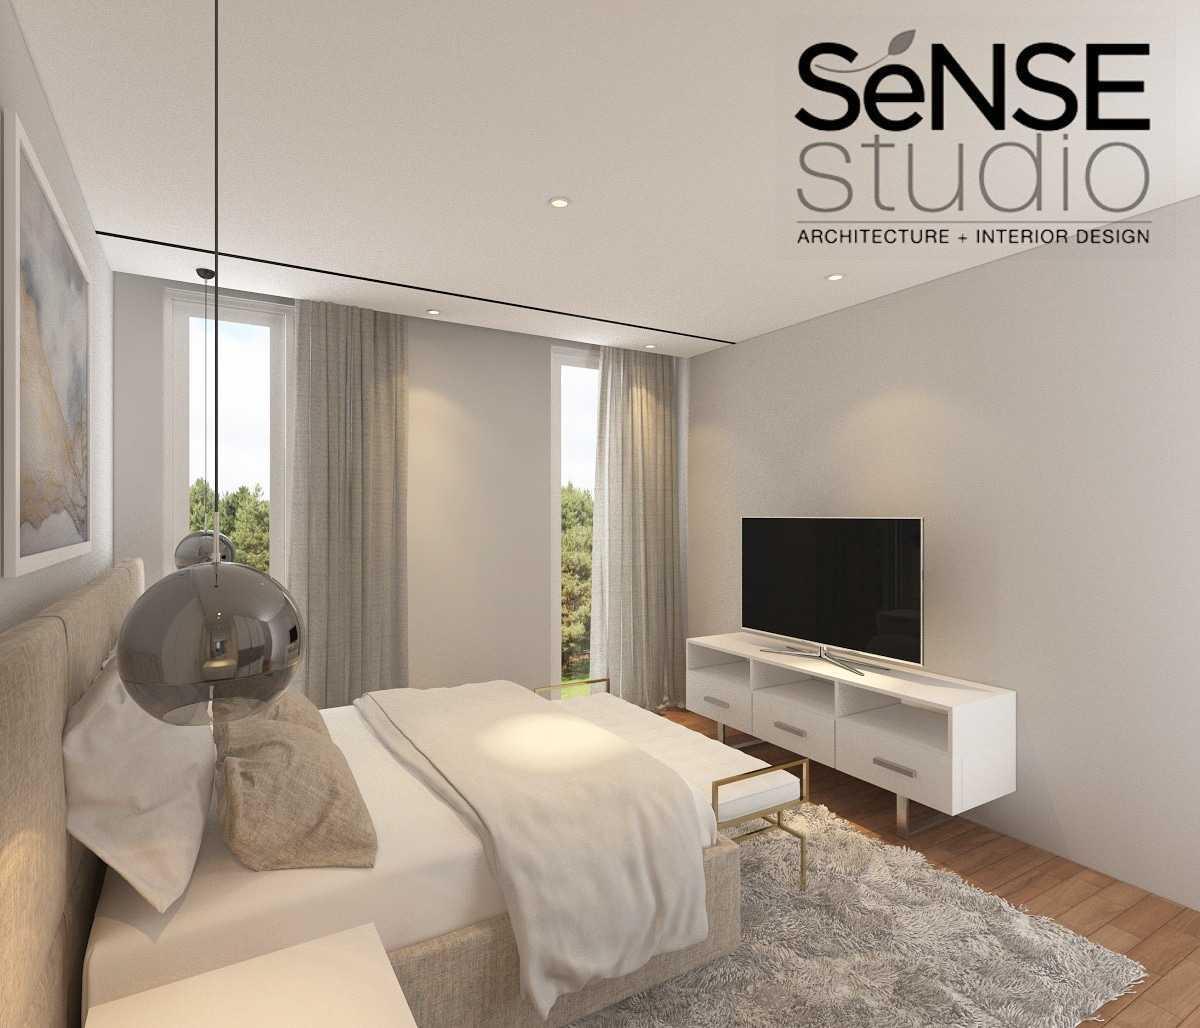 Sense Isle Studio Residence Surabaya Surabaya, Kota Sby, Jawa Timur, Indonesia Surabaya, Kota Sby, Jawa Timur, Indonesia Sense-Studio-Residence-Surabaya  80438